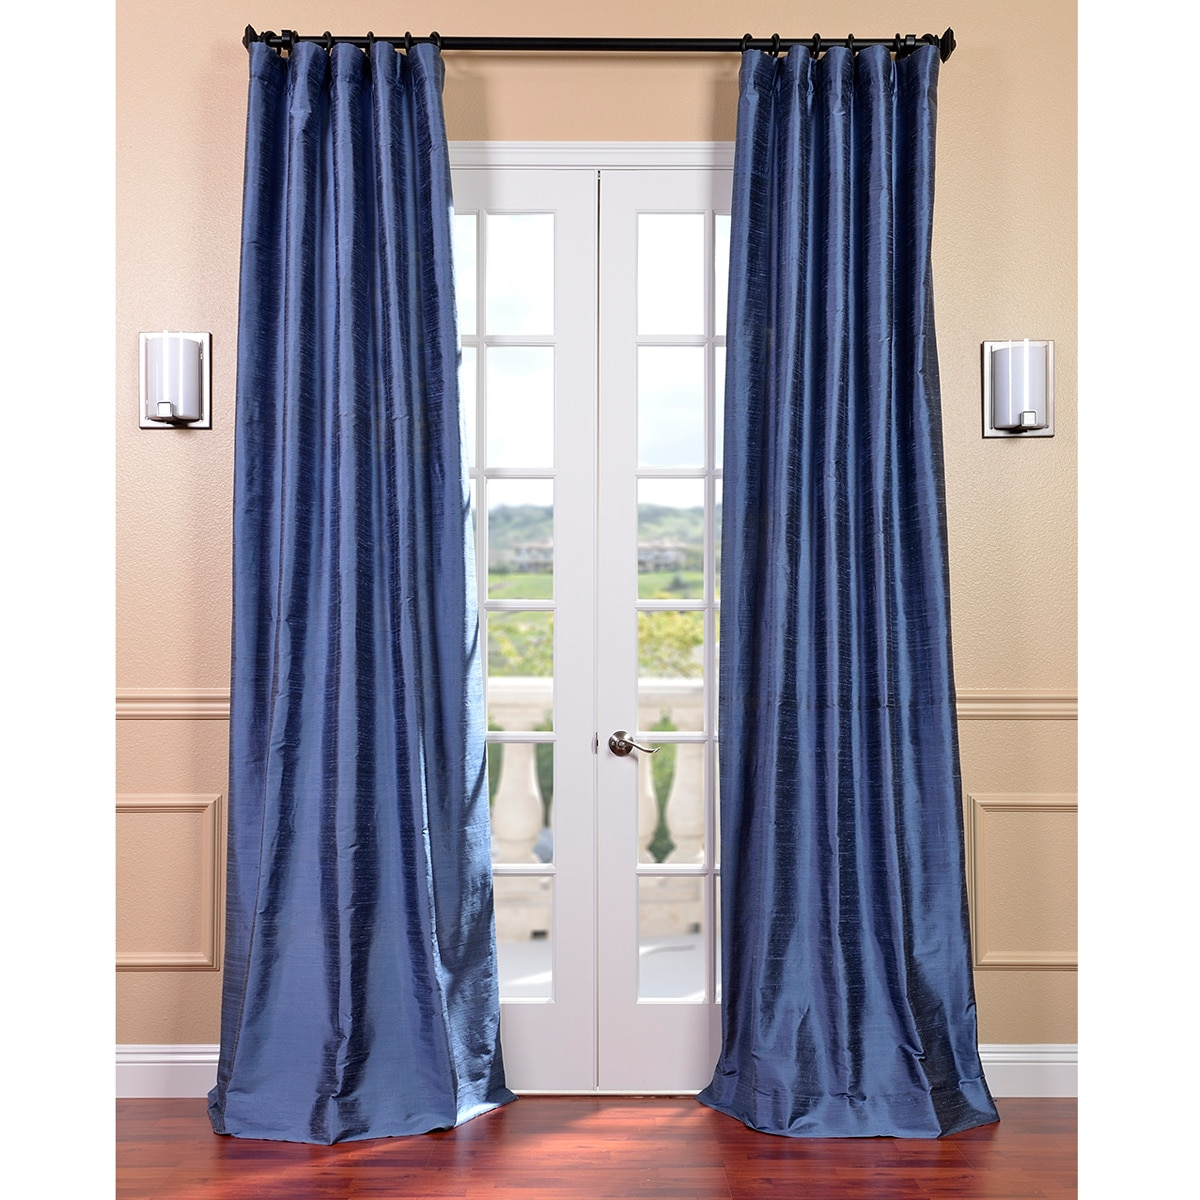 Signature Winter Blue Textured Silk 96-inch Curtain Panel